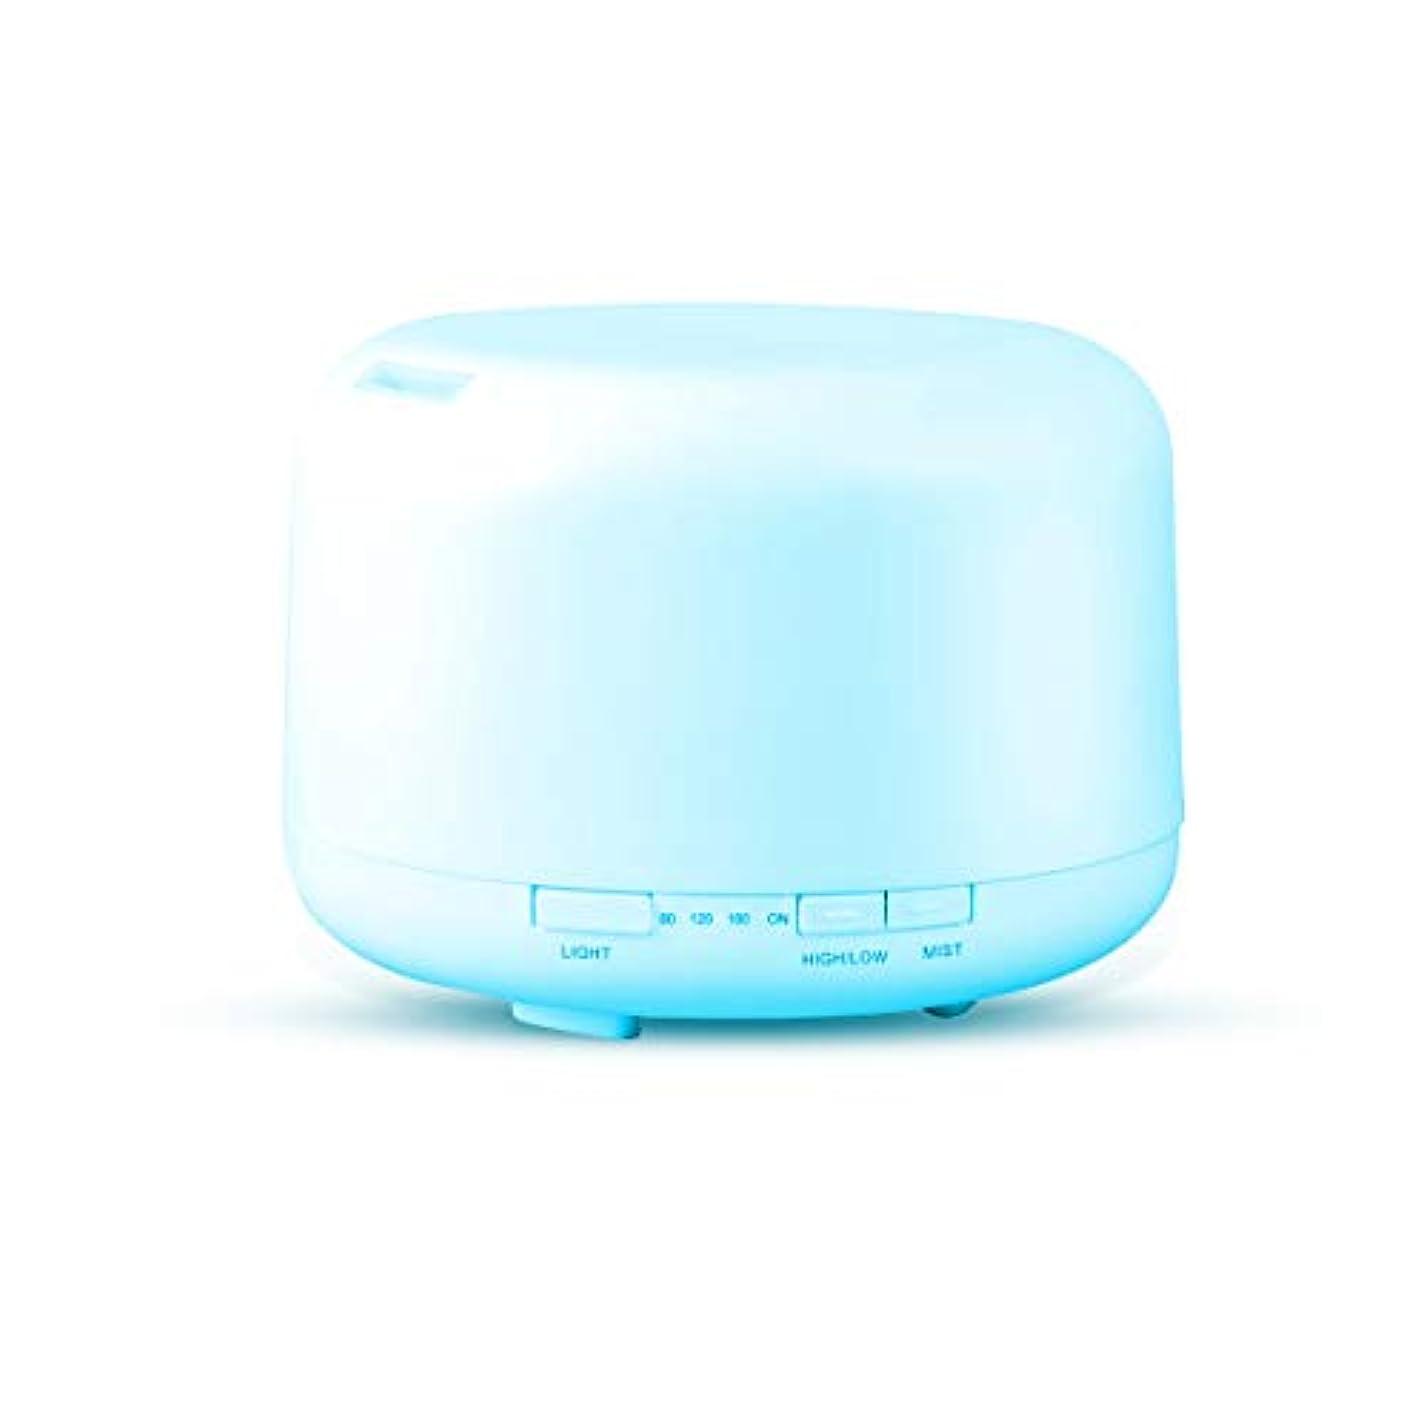 Fashion·LIFE アロマディフューザー アロマ加湿器 超音波式 500ml 空気清浄機 七色変換LEDライト 静音 タイマー機能 空焚き防止 部屋 会社 温泉など用